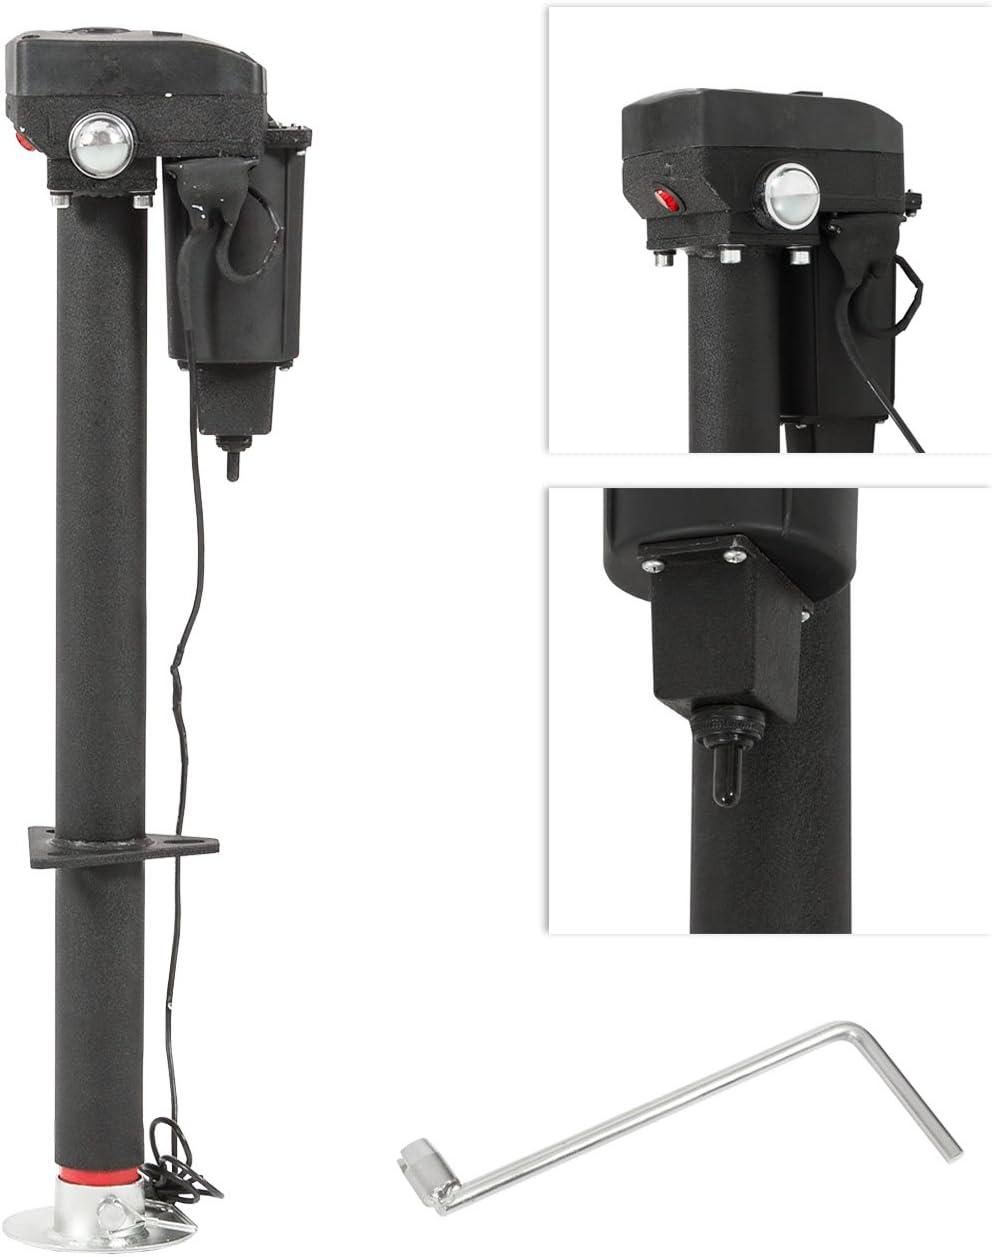 Trailer Jack Rv Electric Tongue Foot Pad 12 Volts Automotive Manual Adjustable